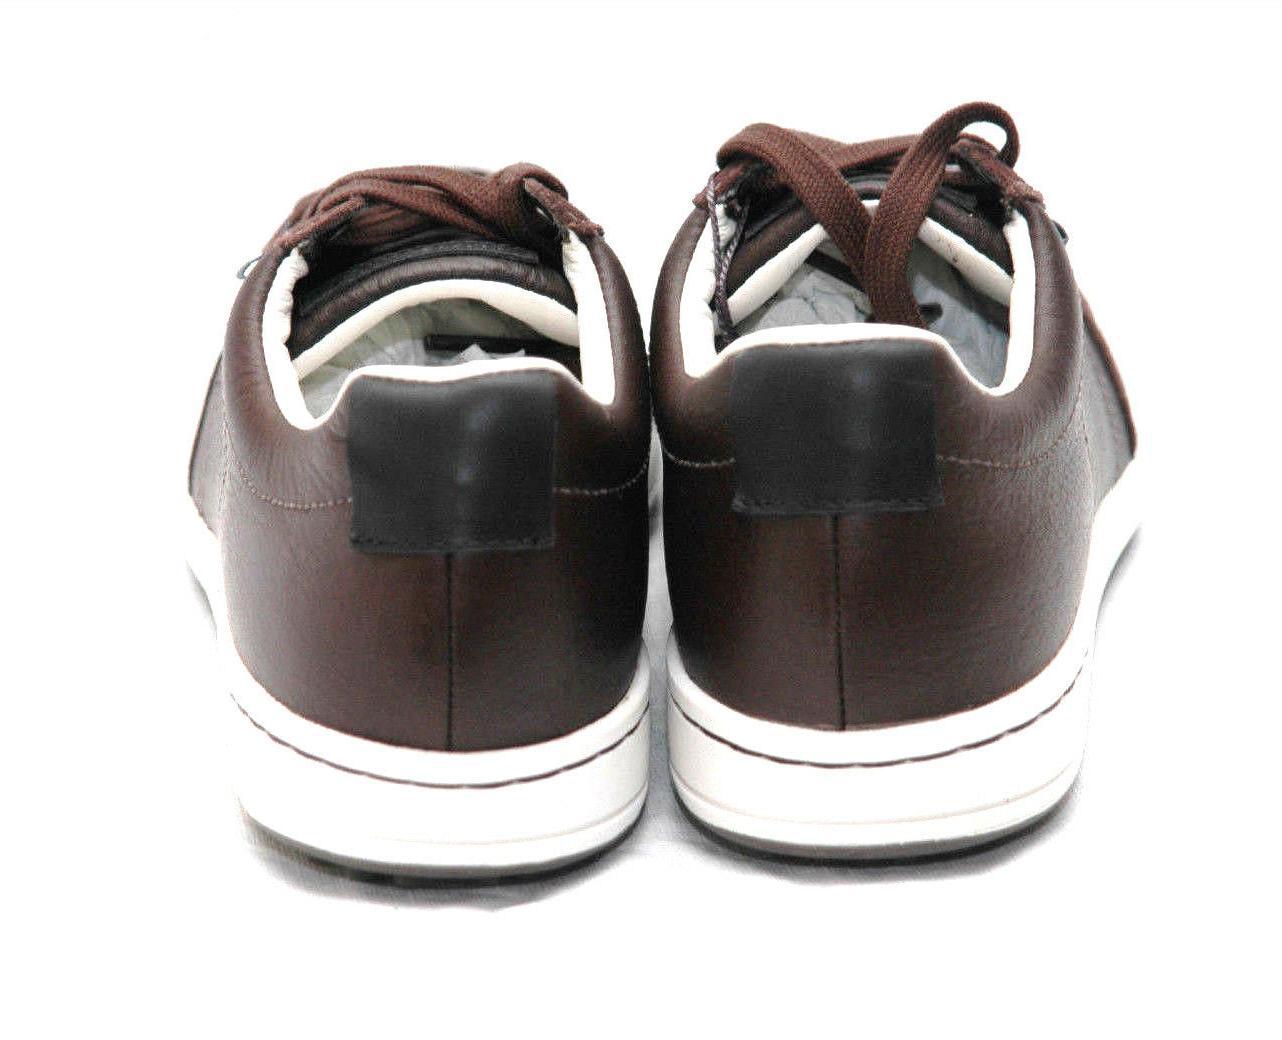 New Ashworth Cardiff Mens Size- 7 Shoes G54171